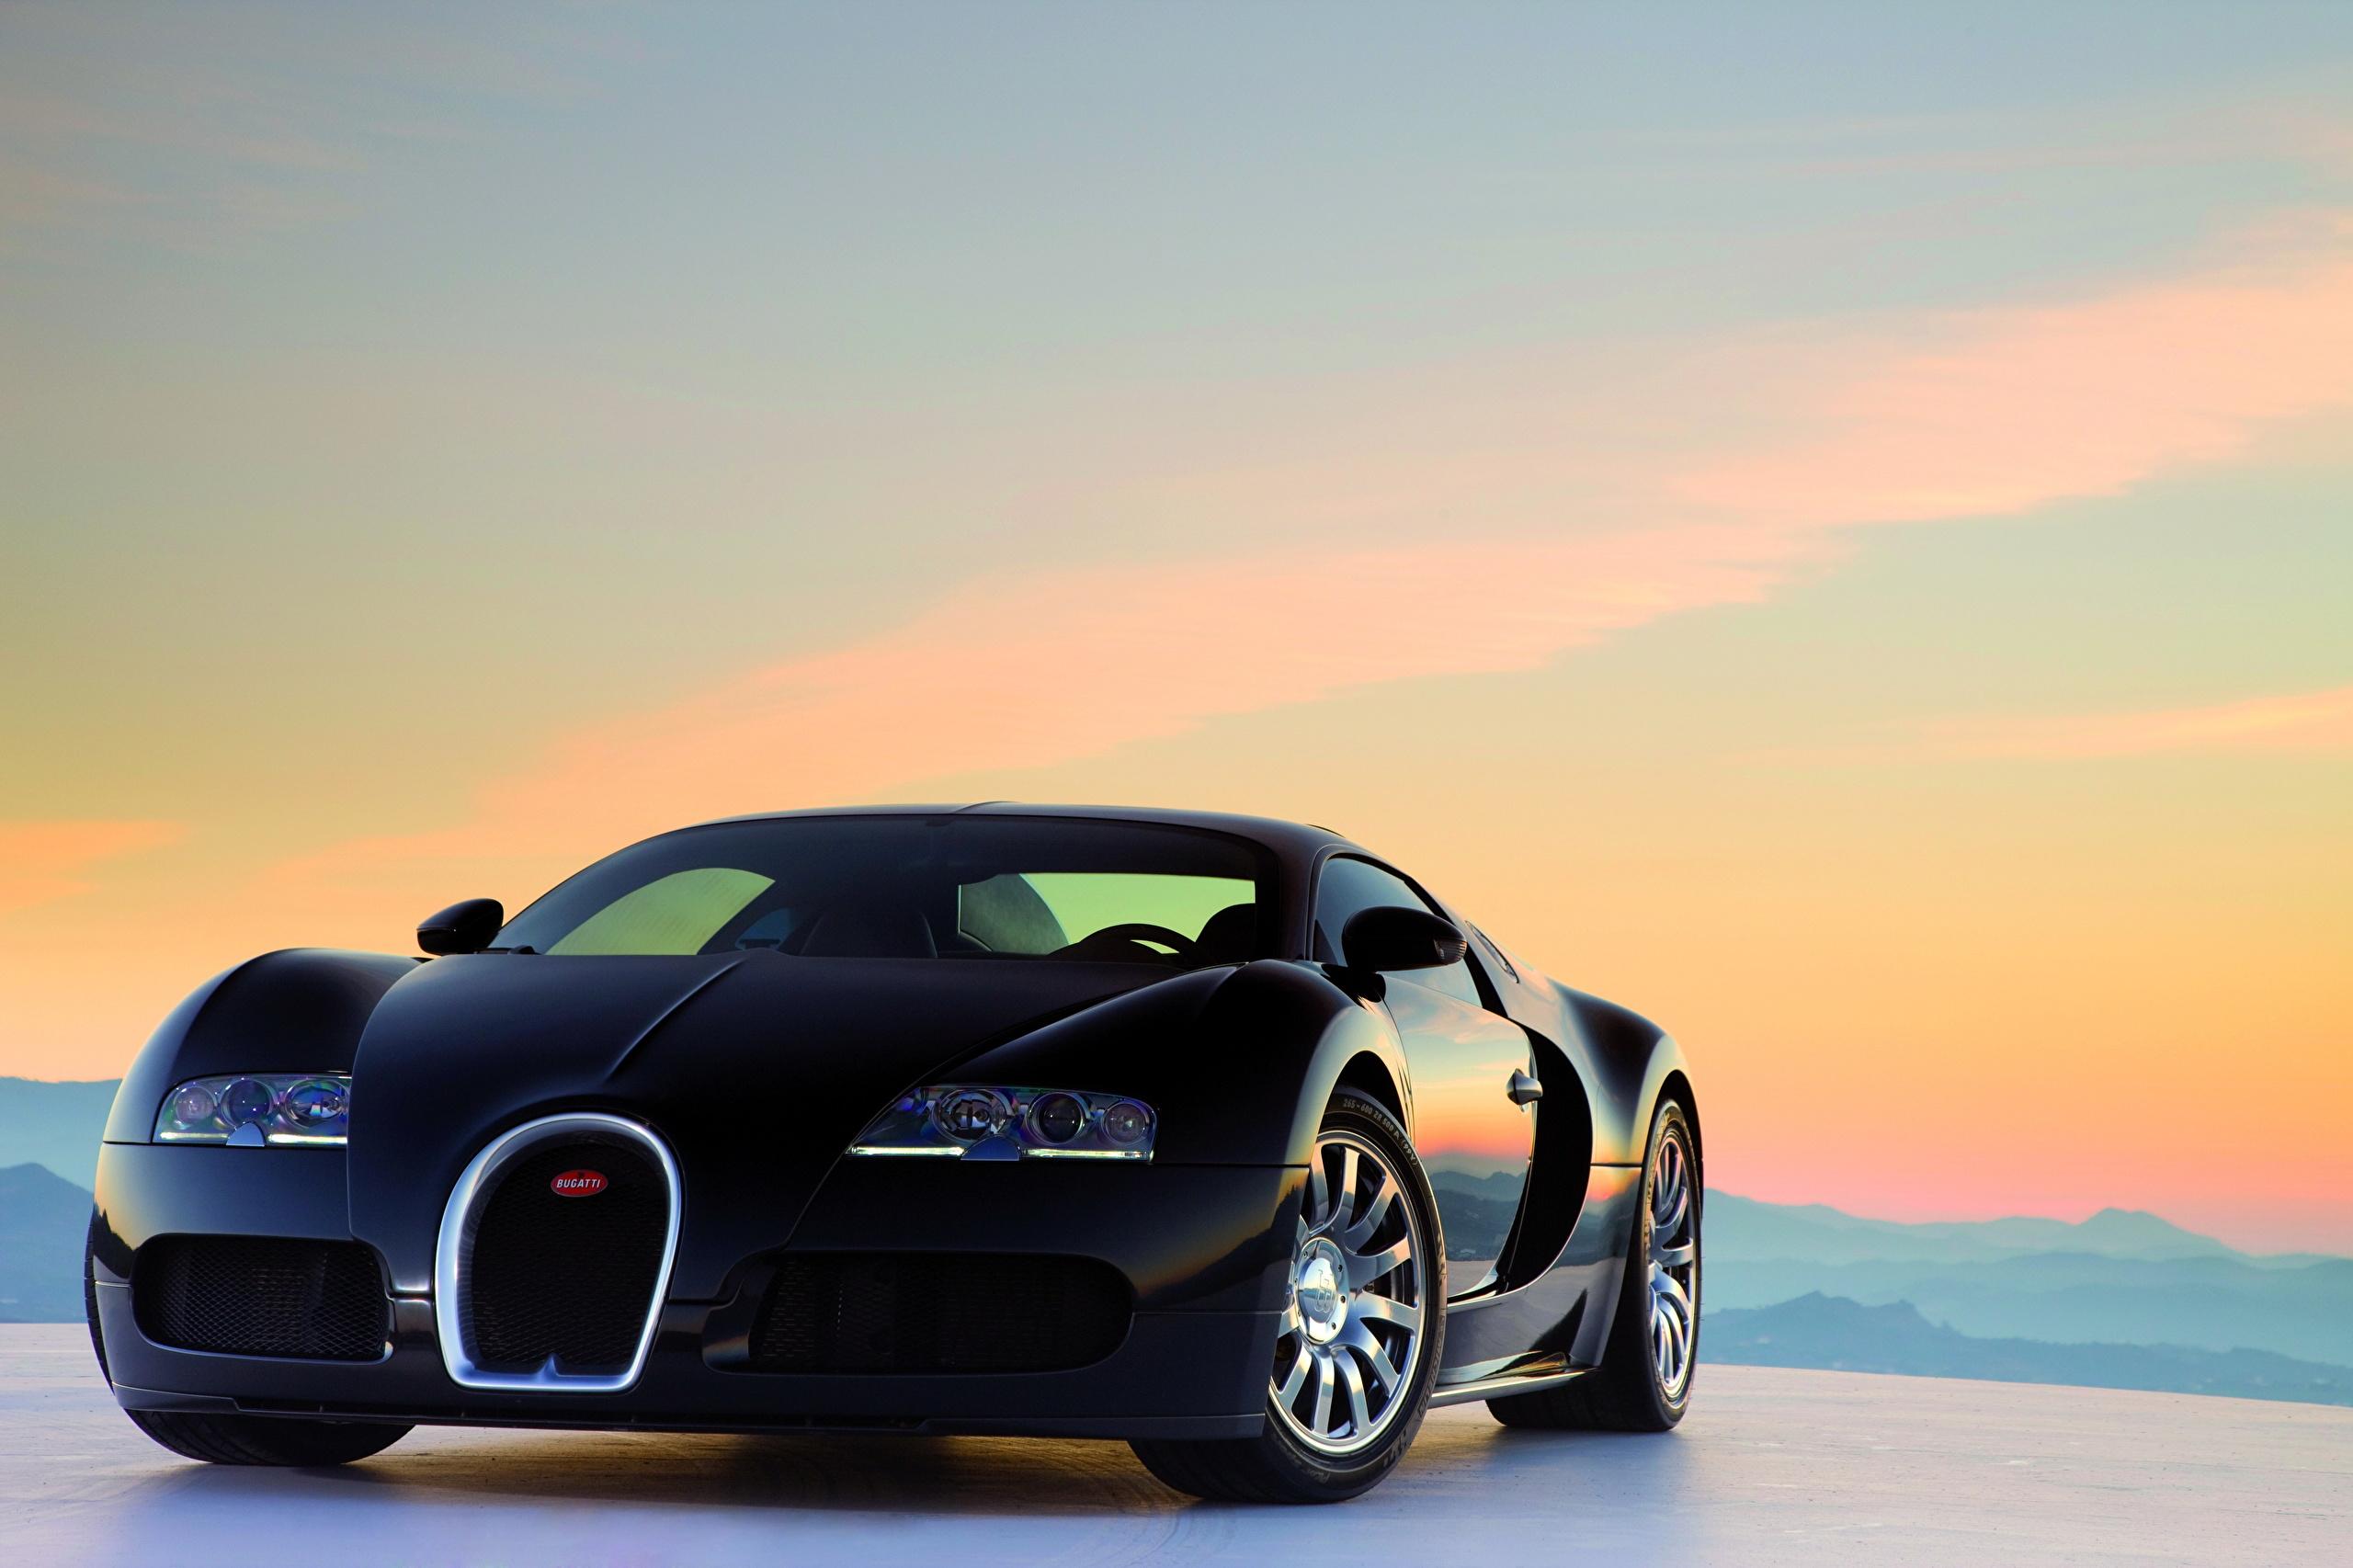 Bugatti black  № 2413043 бесплатно